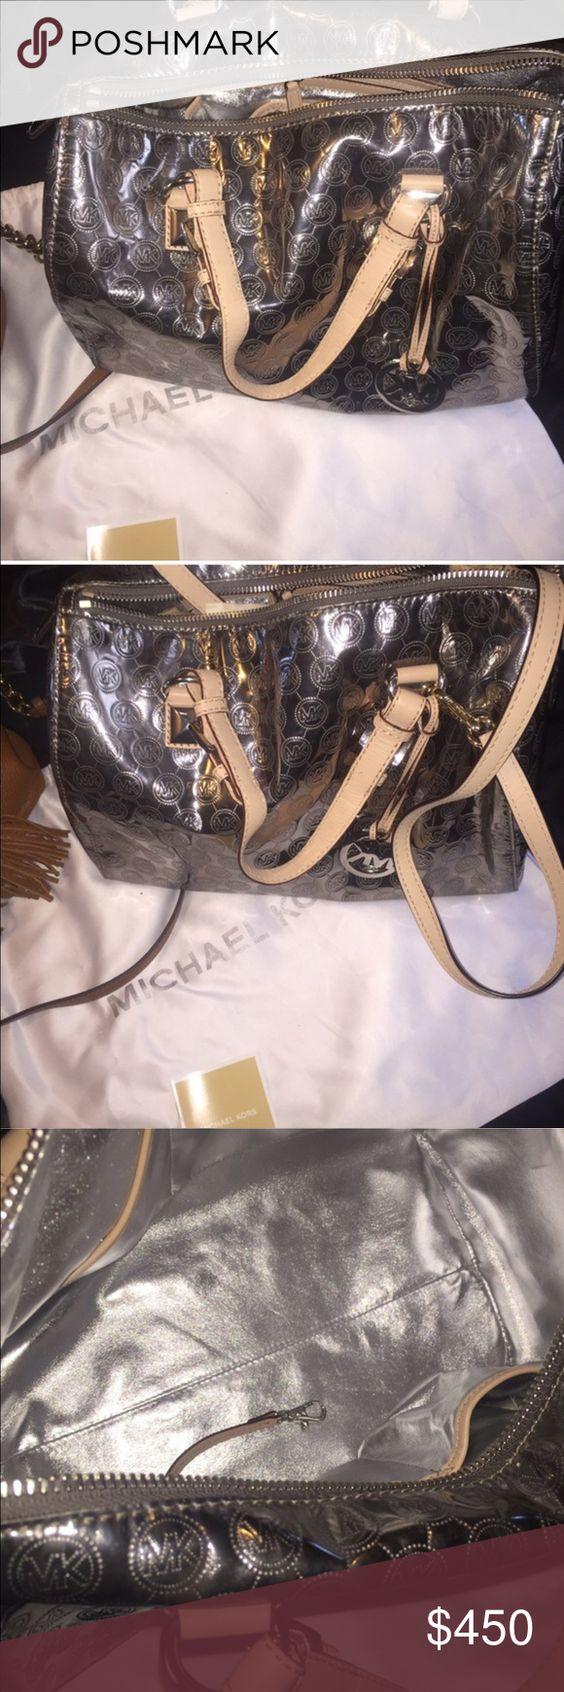 MICHAEL KORS Libe new. W/out tags. Michael Kors Bags